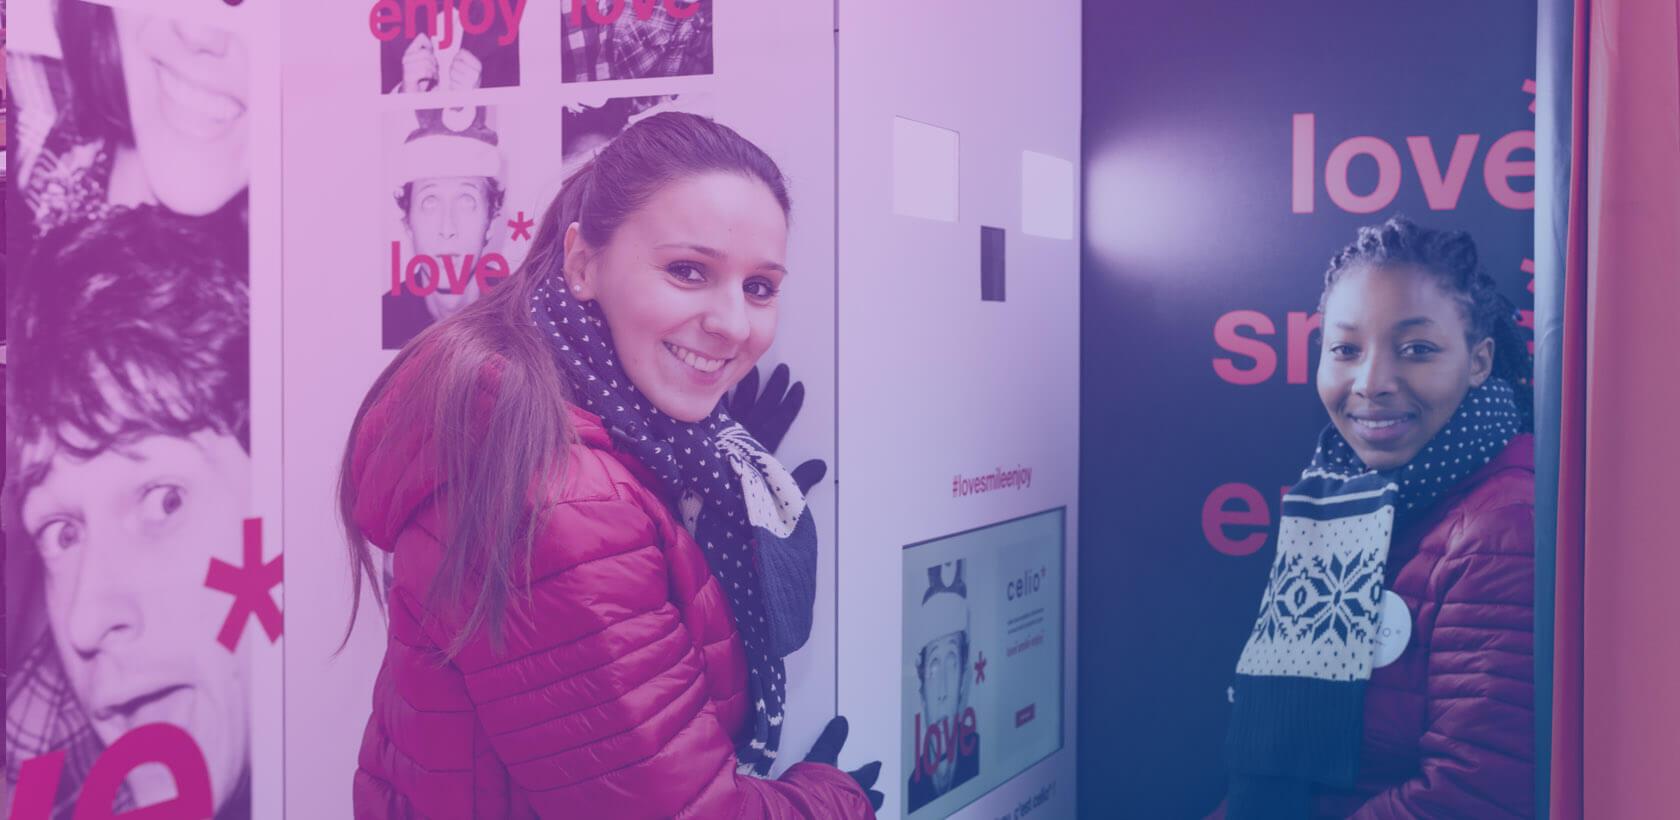 Celio #LOVESMILEENJOY - Agence Globe shopper marketing